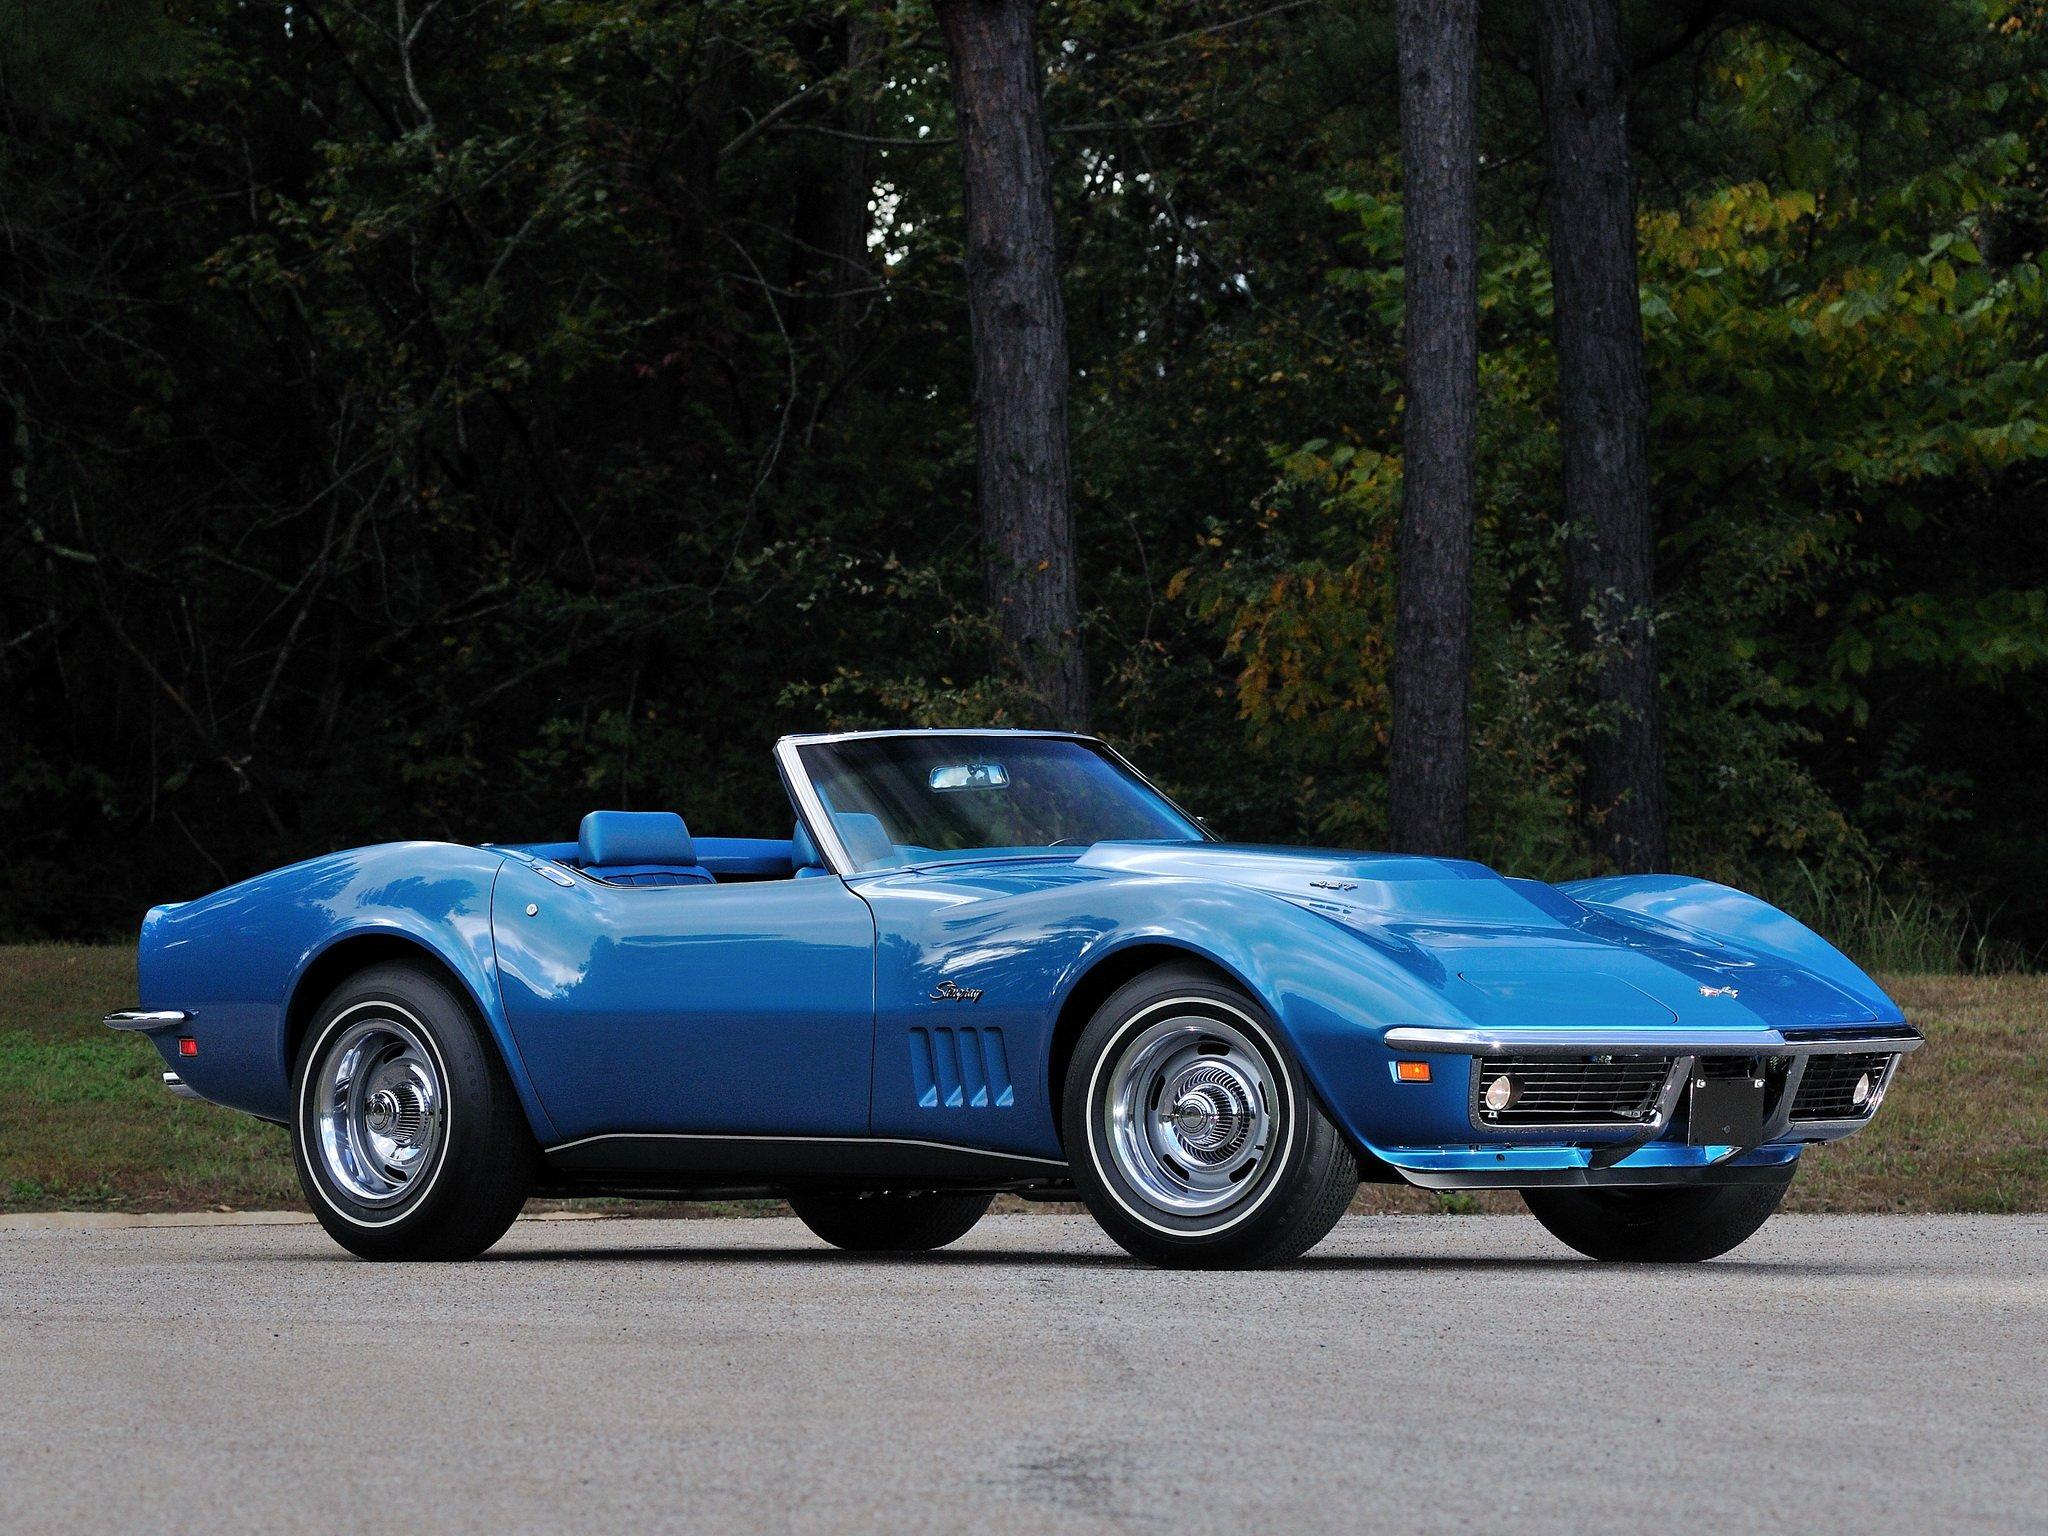 1969 chevrolet corvette stingray l88 427 convertible c 3 muscle. Cars Review. Best American Auto & Cars Review